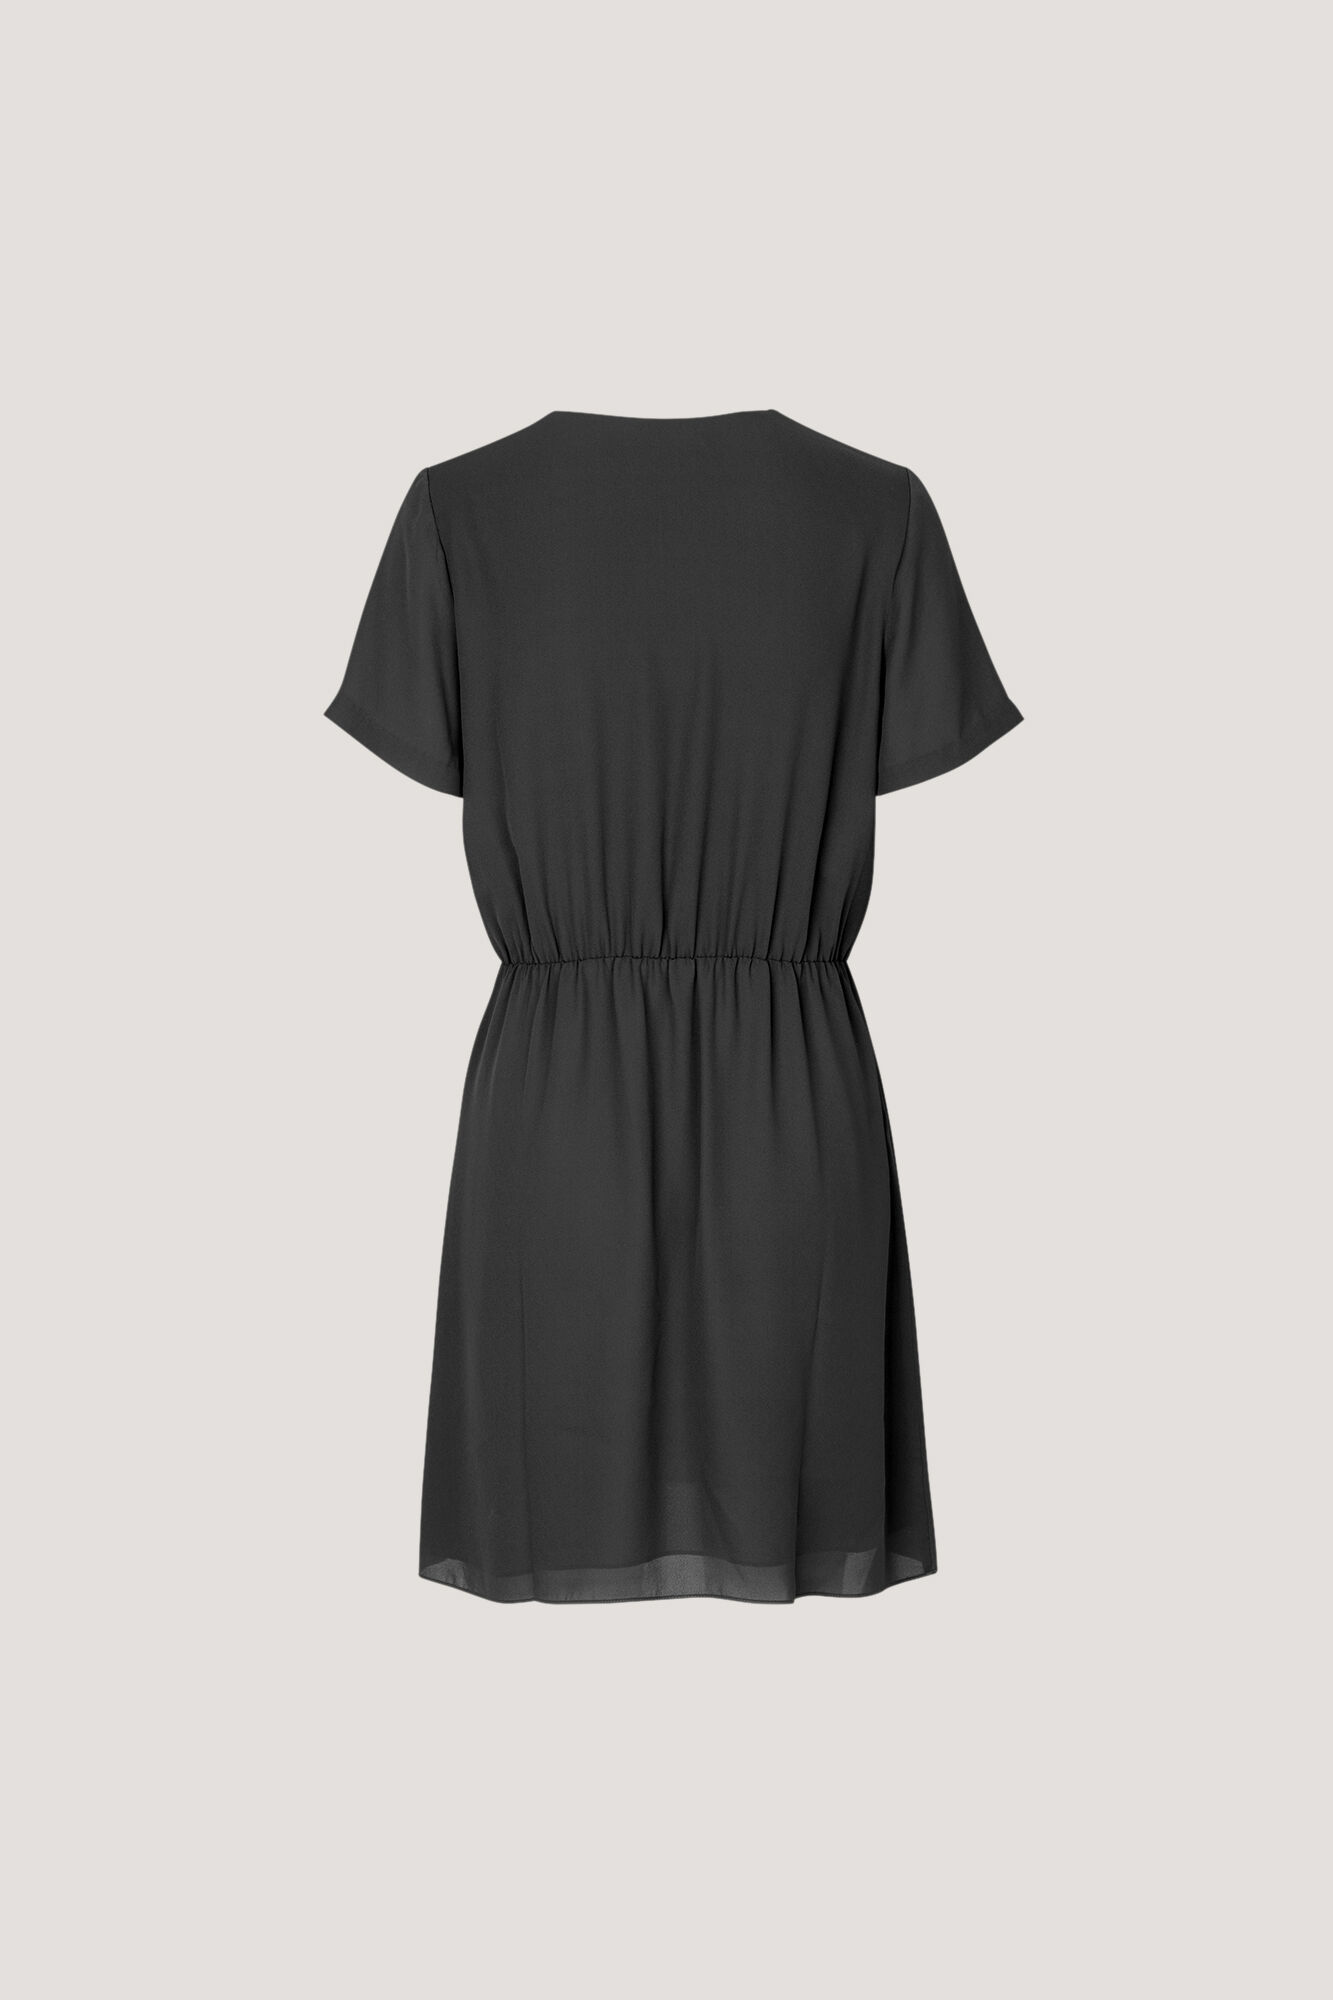 Doris s dress 3973